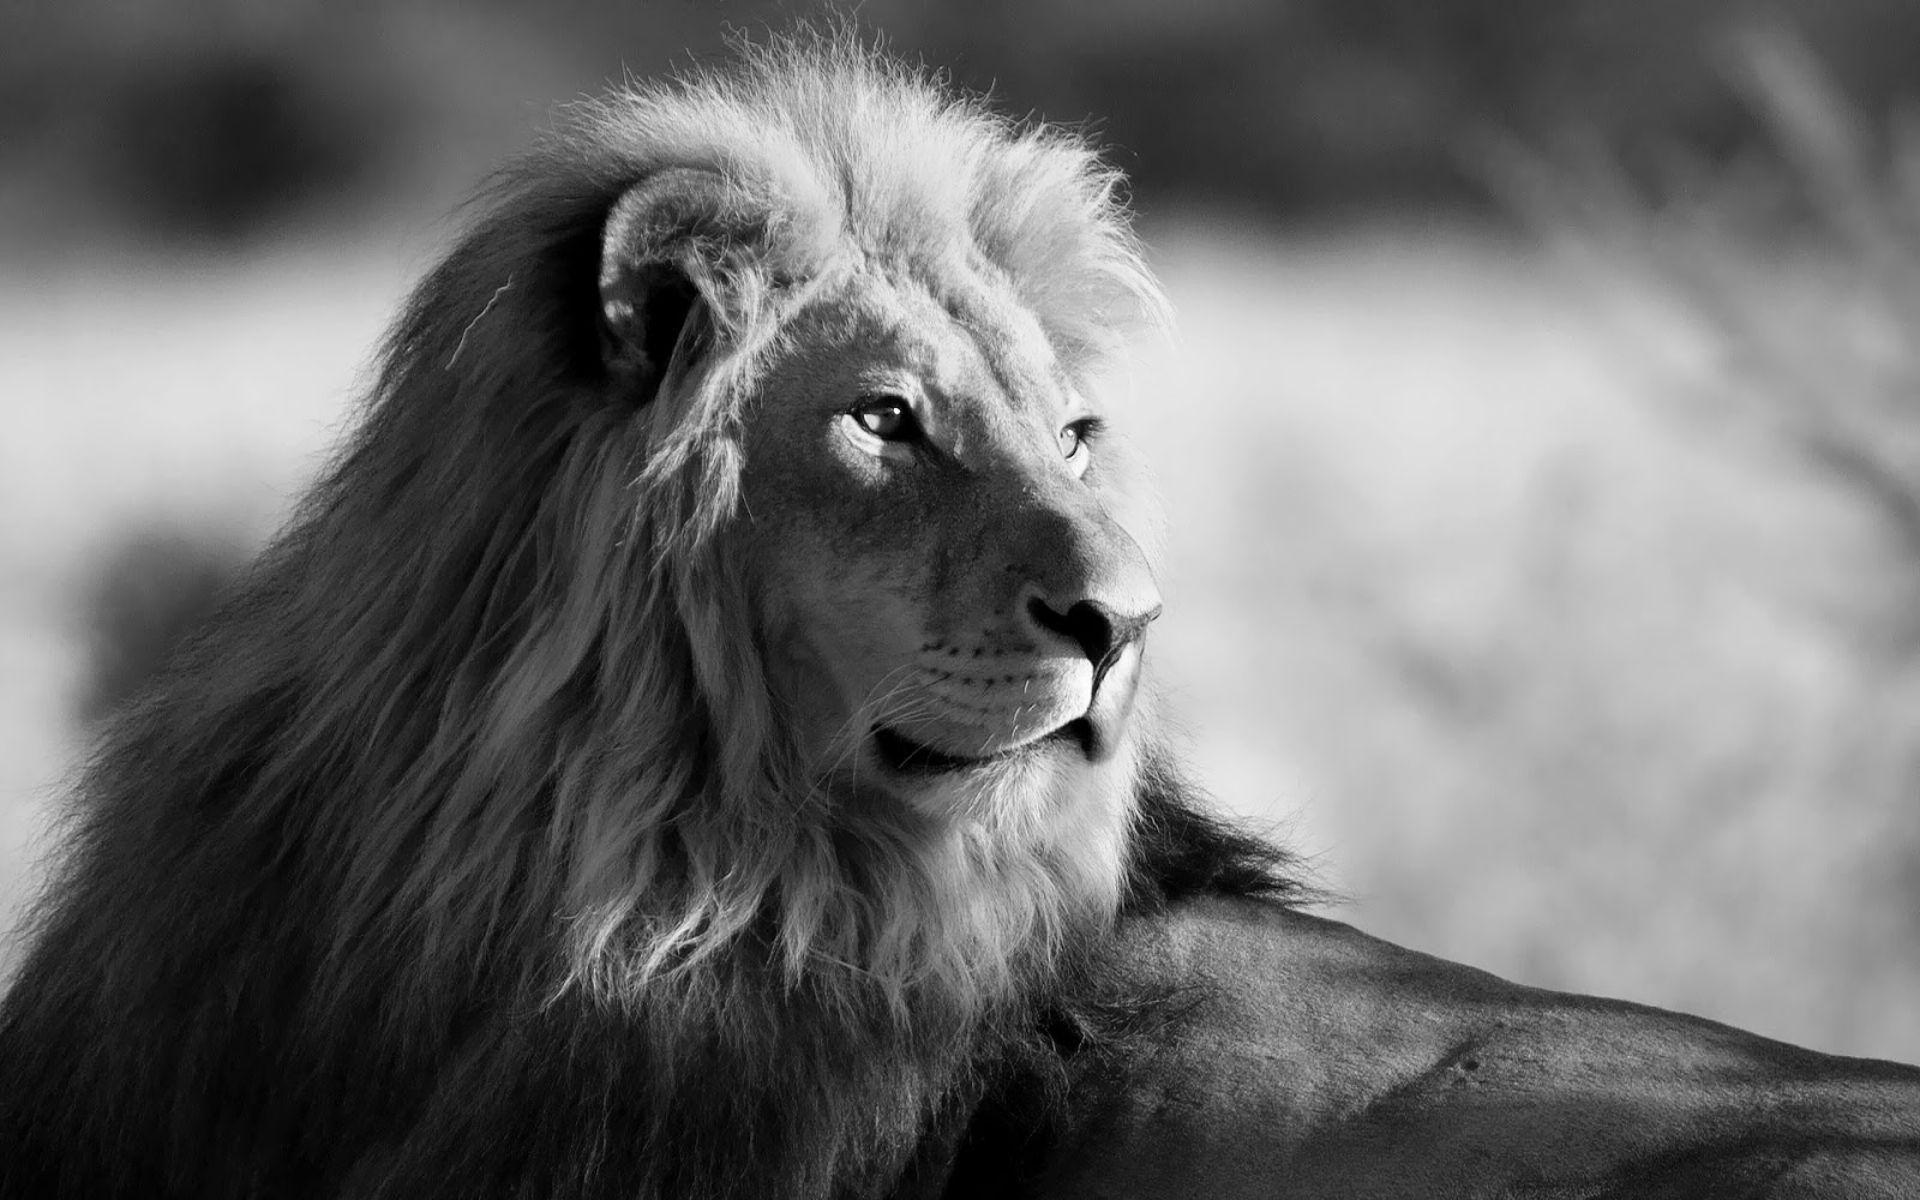 Black And White Lion White Lion Images White Lion